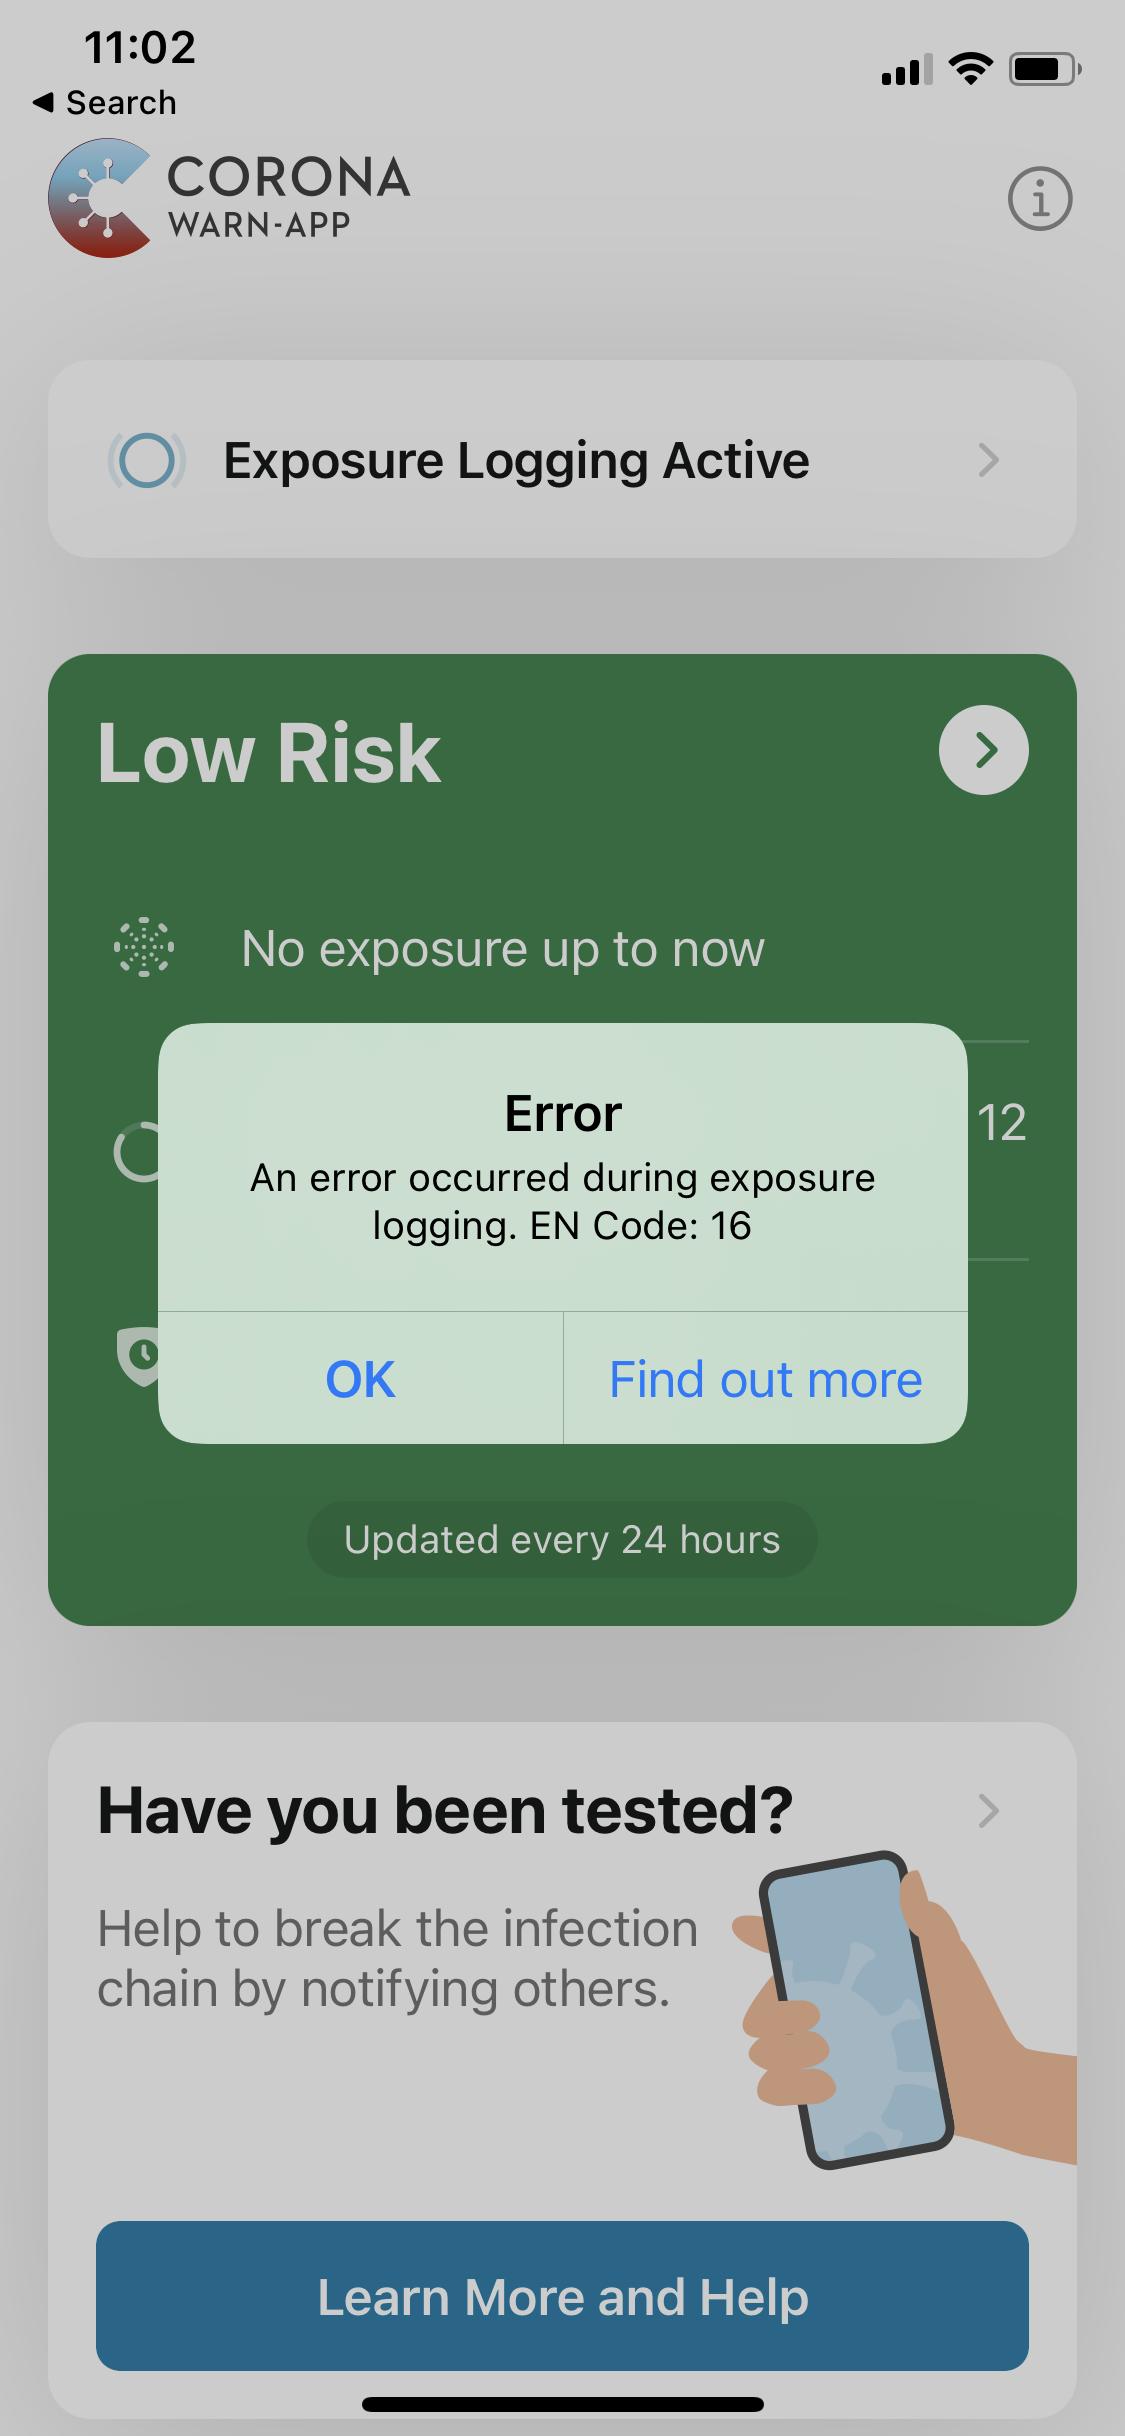 Corona App Error